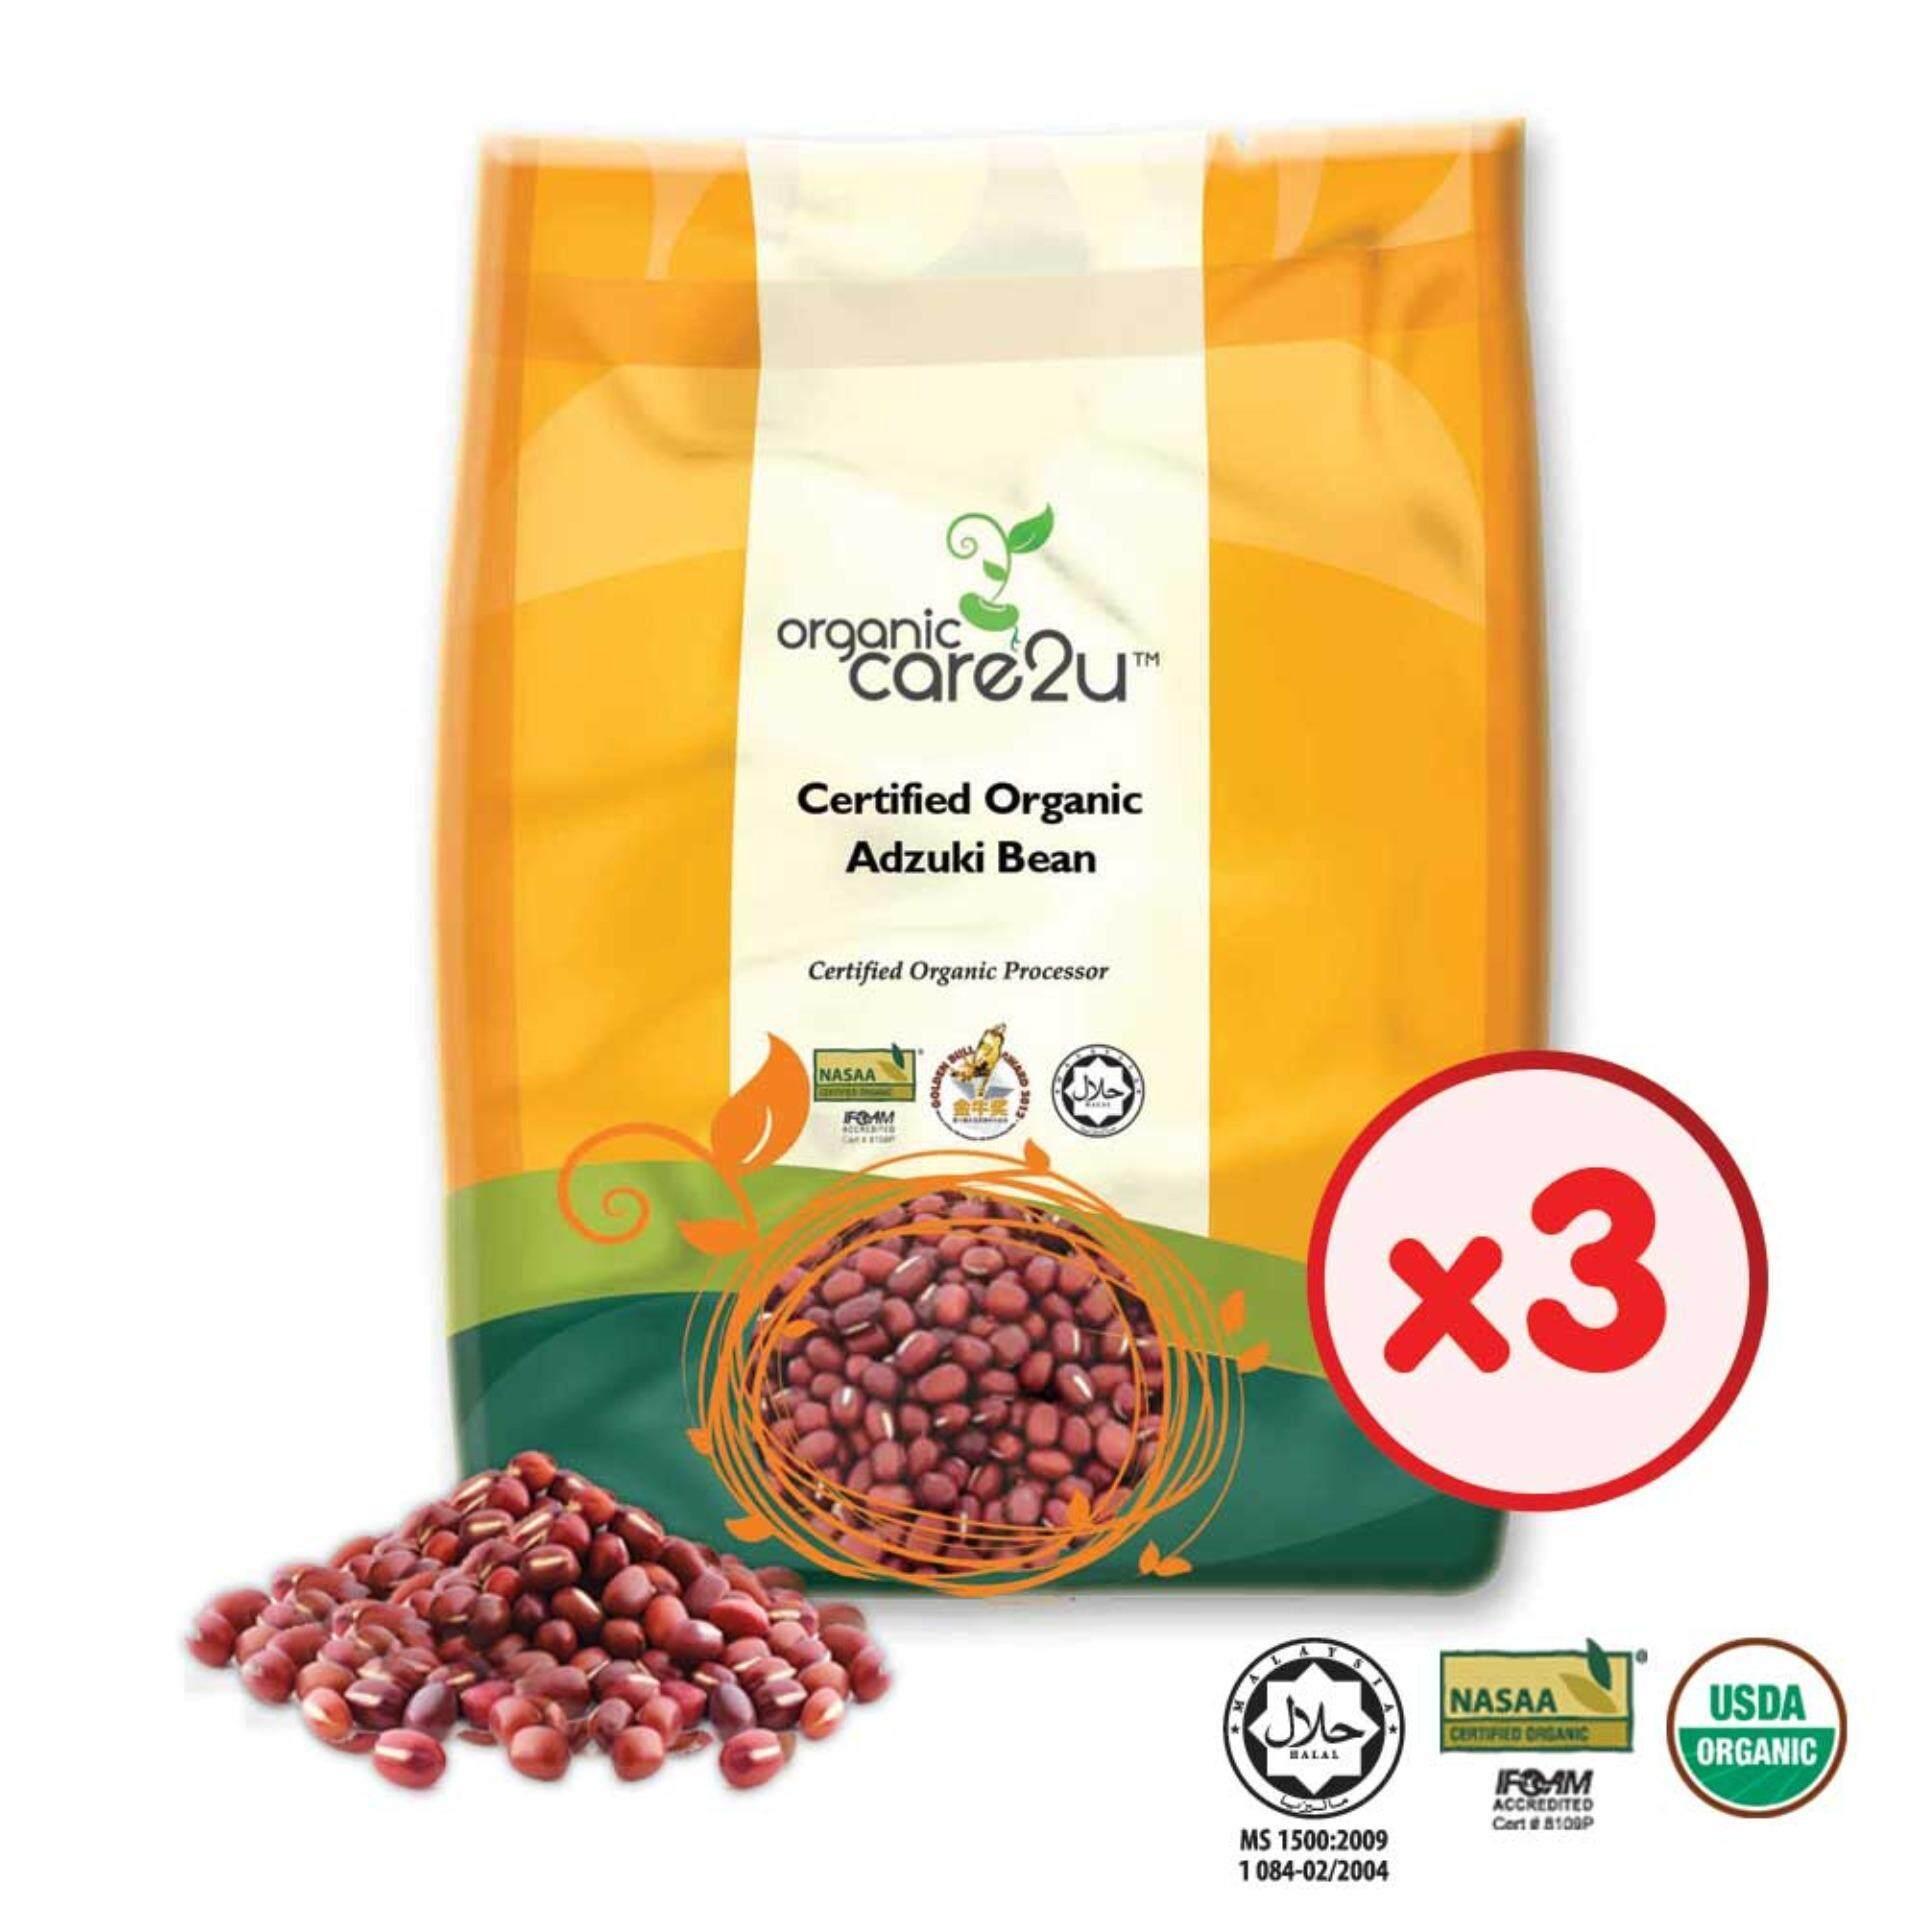 Organic Care2u Organic Adzuki Bean (400g) - [Bundle of 3]